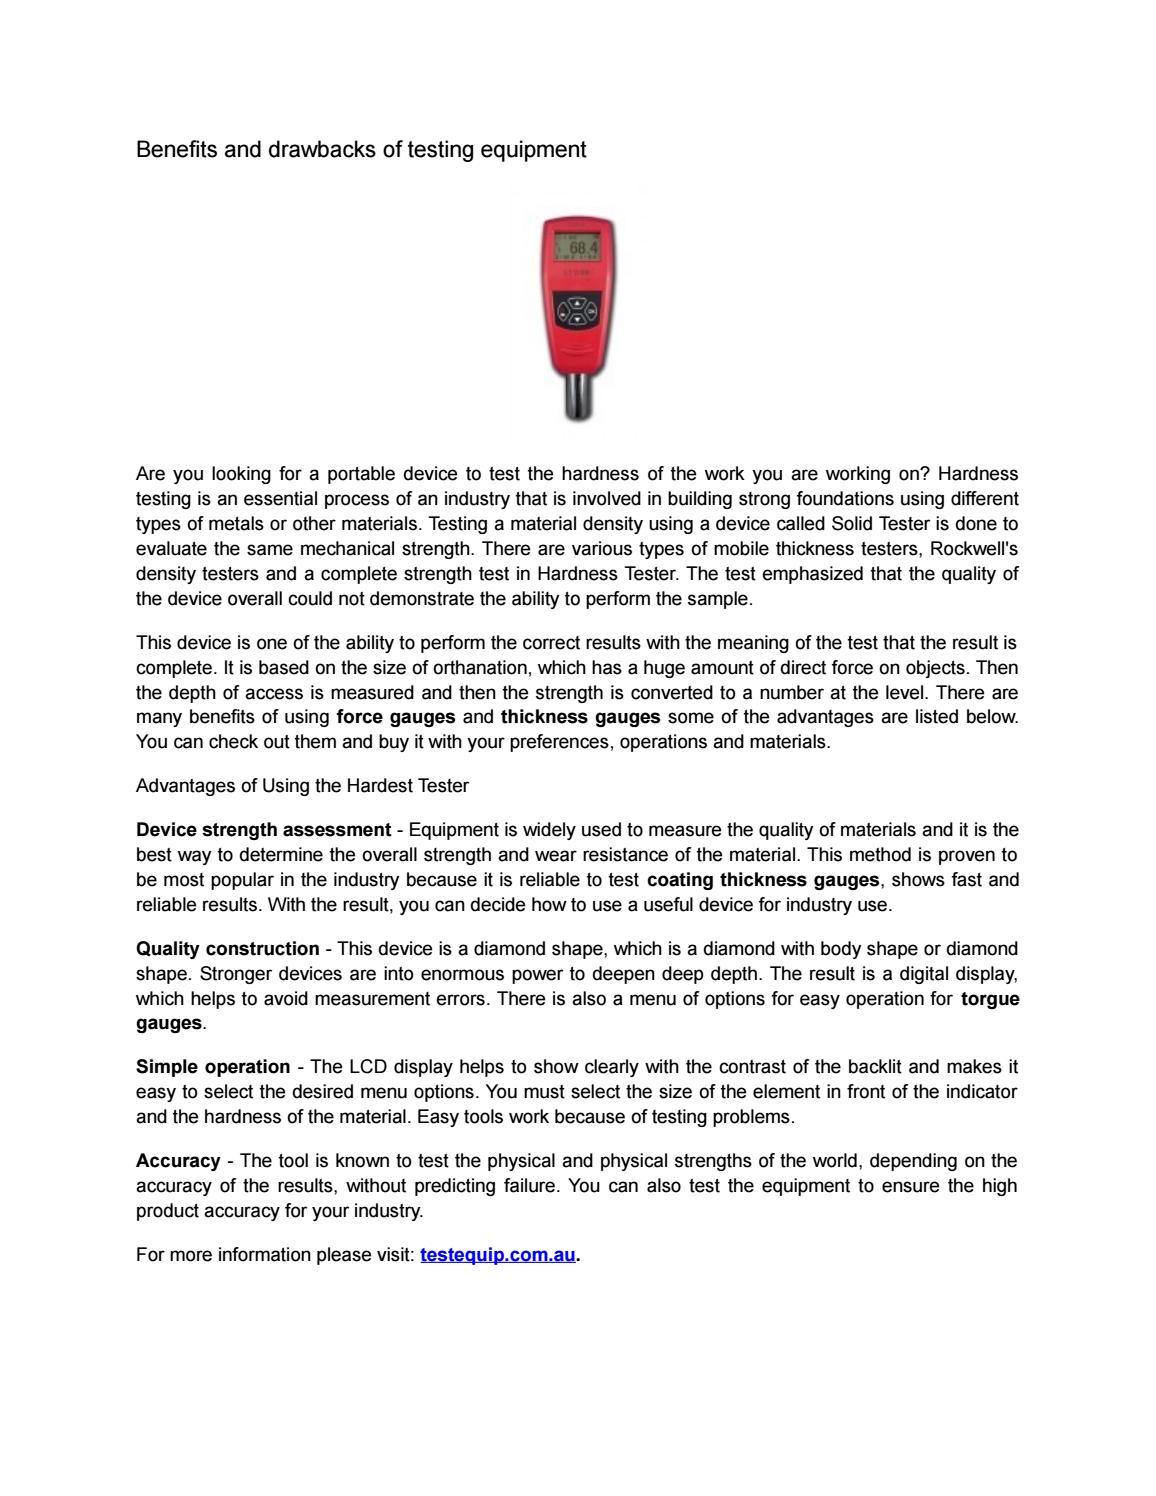 Benefits and drawbacks of testing equipment by Testing Equipment ...